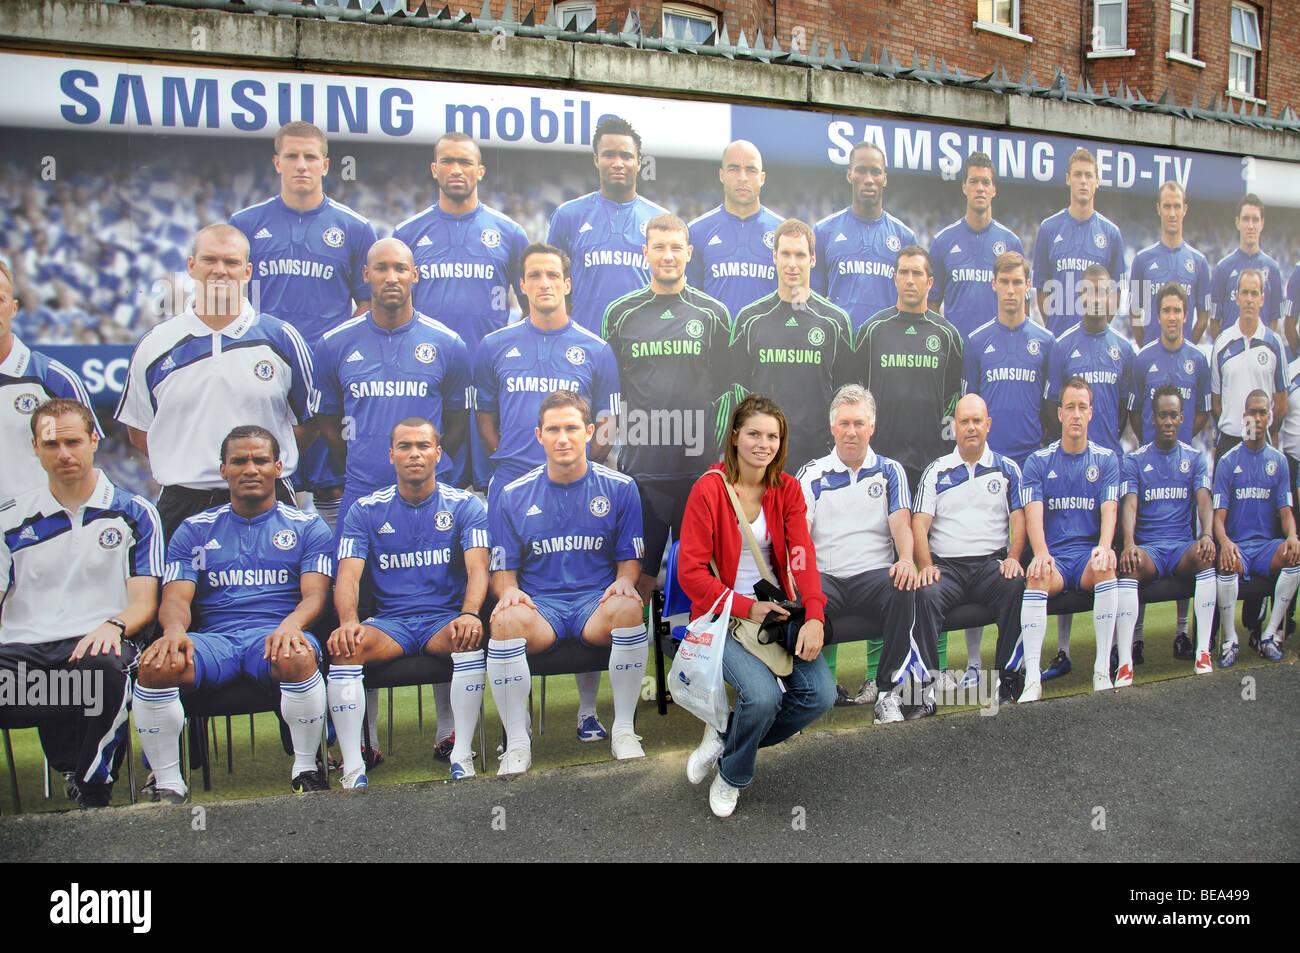 Team poster, Stanford Bridge Football Ground, Fulham, London Borough of Hammersmith and Fulham, London, England, - Stock Image